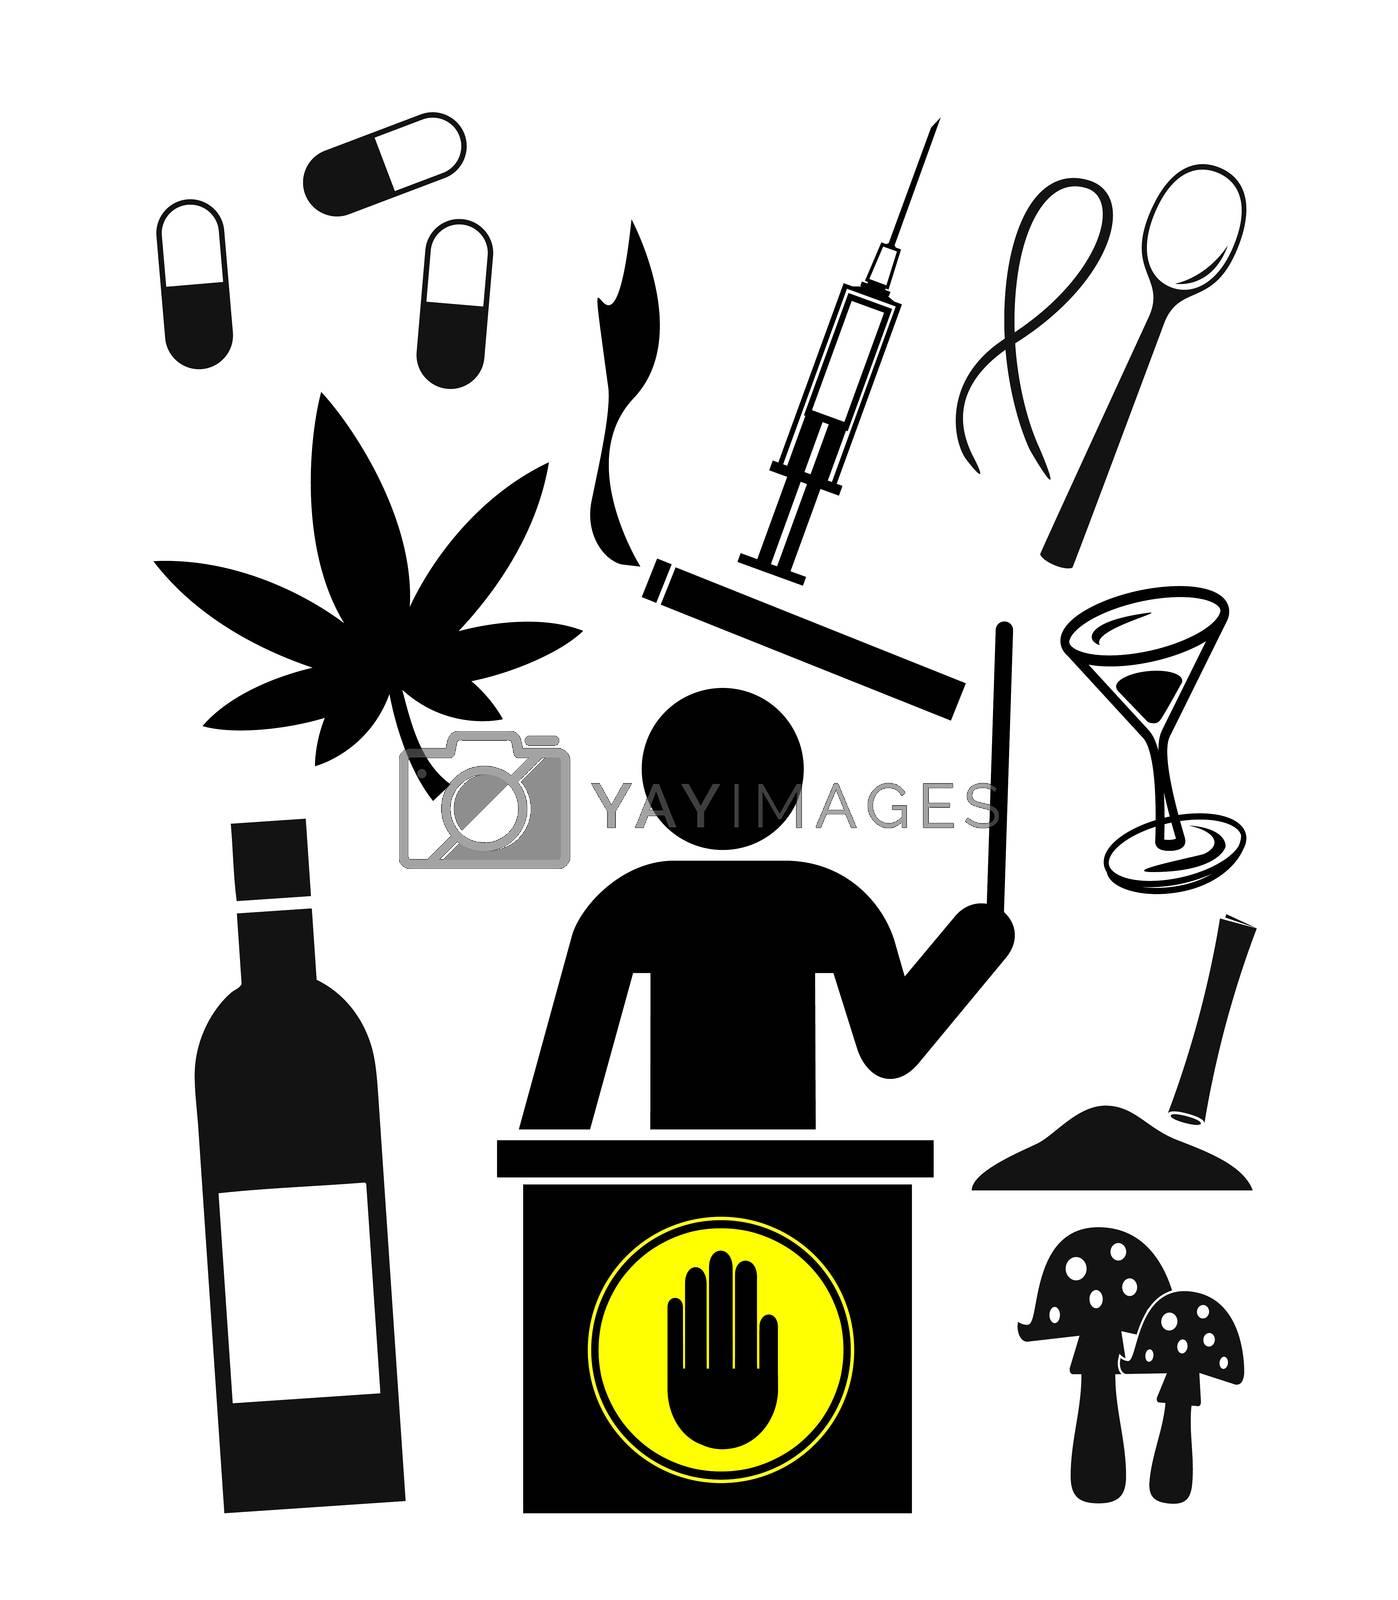 Concept sign for drug prevention programs